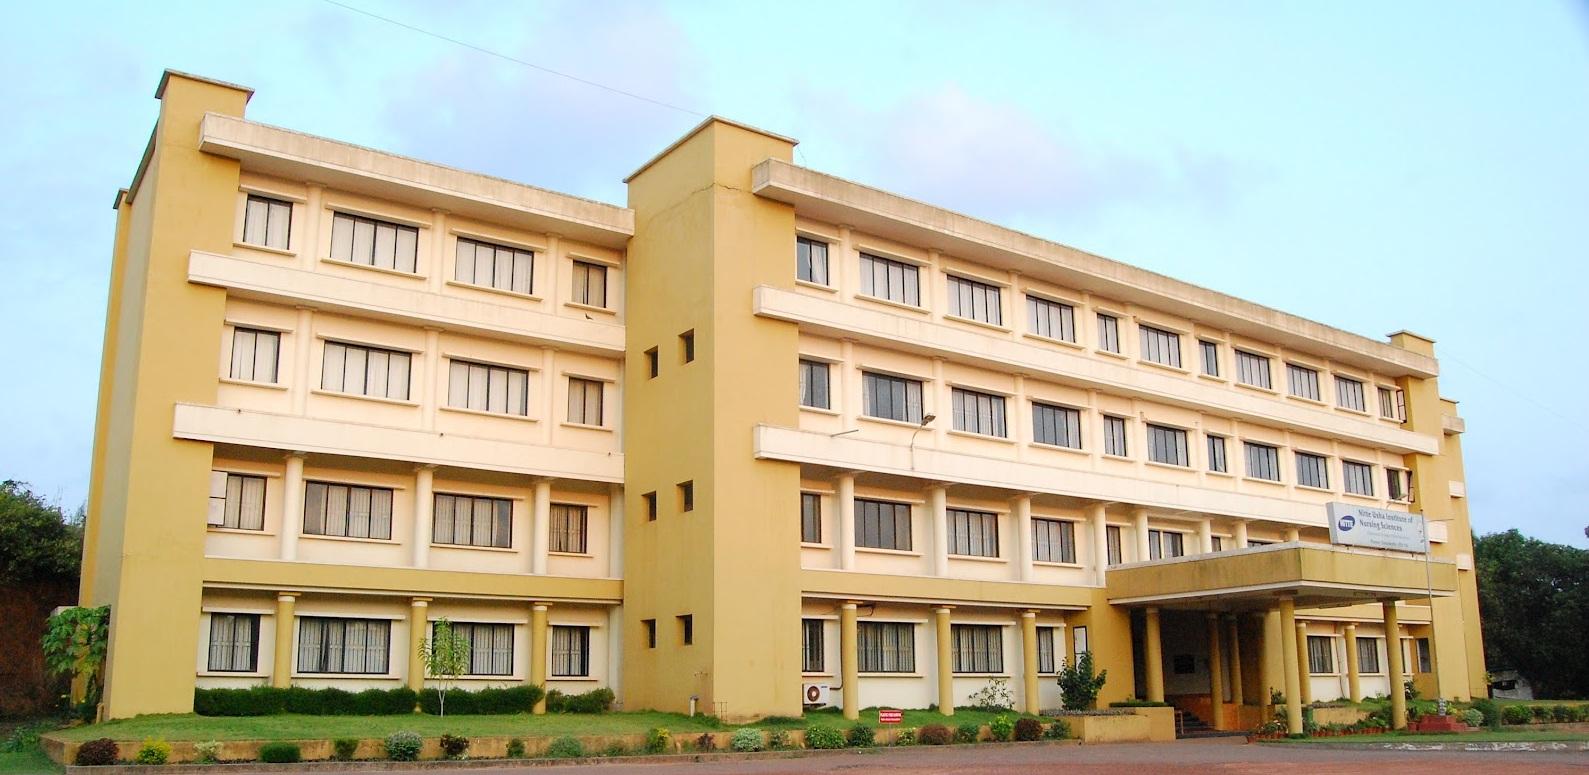 Nitte Gulabi Shetty Memorial Institute of Pharmaceutical Sciences, Mangaluru